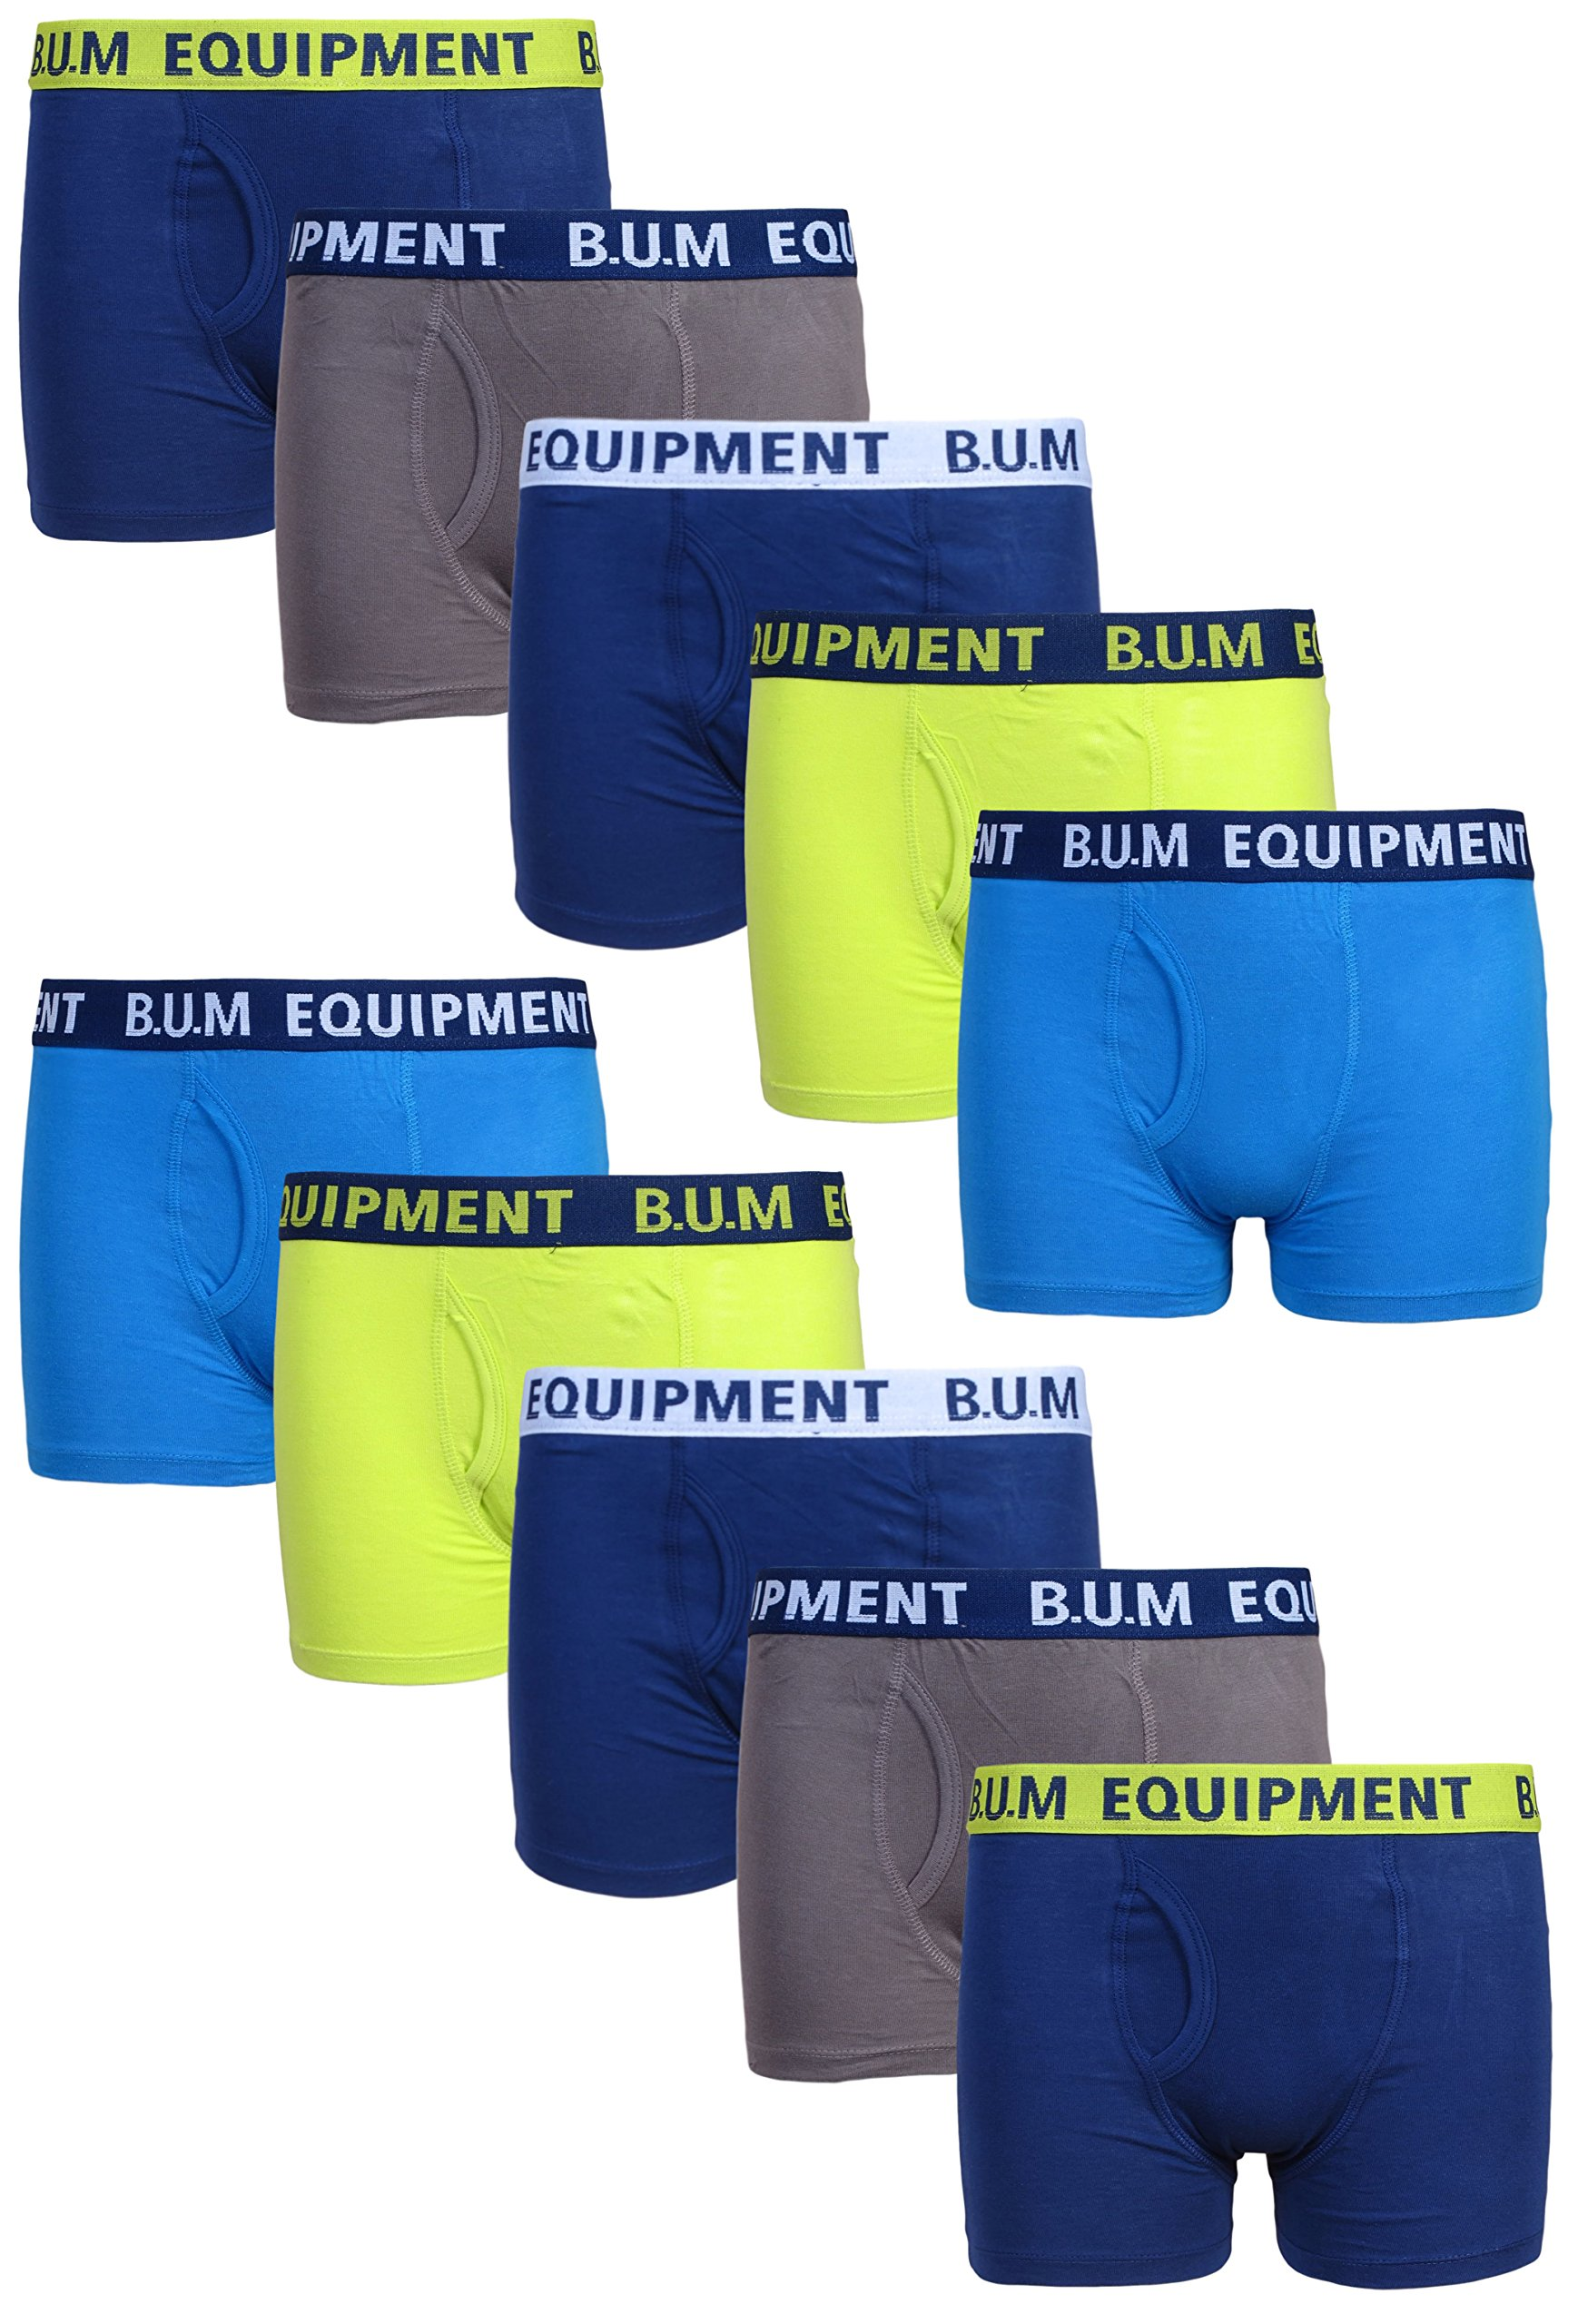 B.U.M. Equipment Boys 10 Pack Solid Boxer Briefs Underwear, Fashion, Small/6-7'